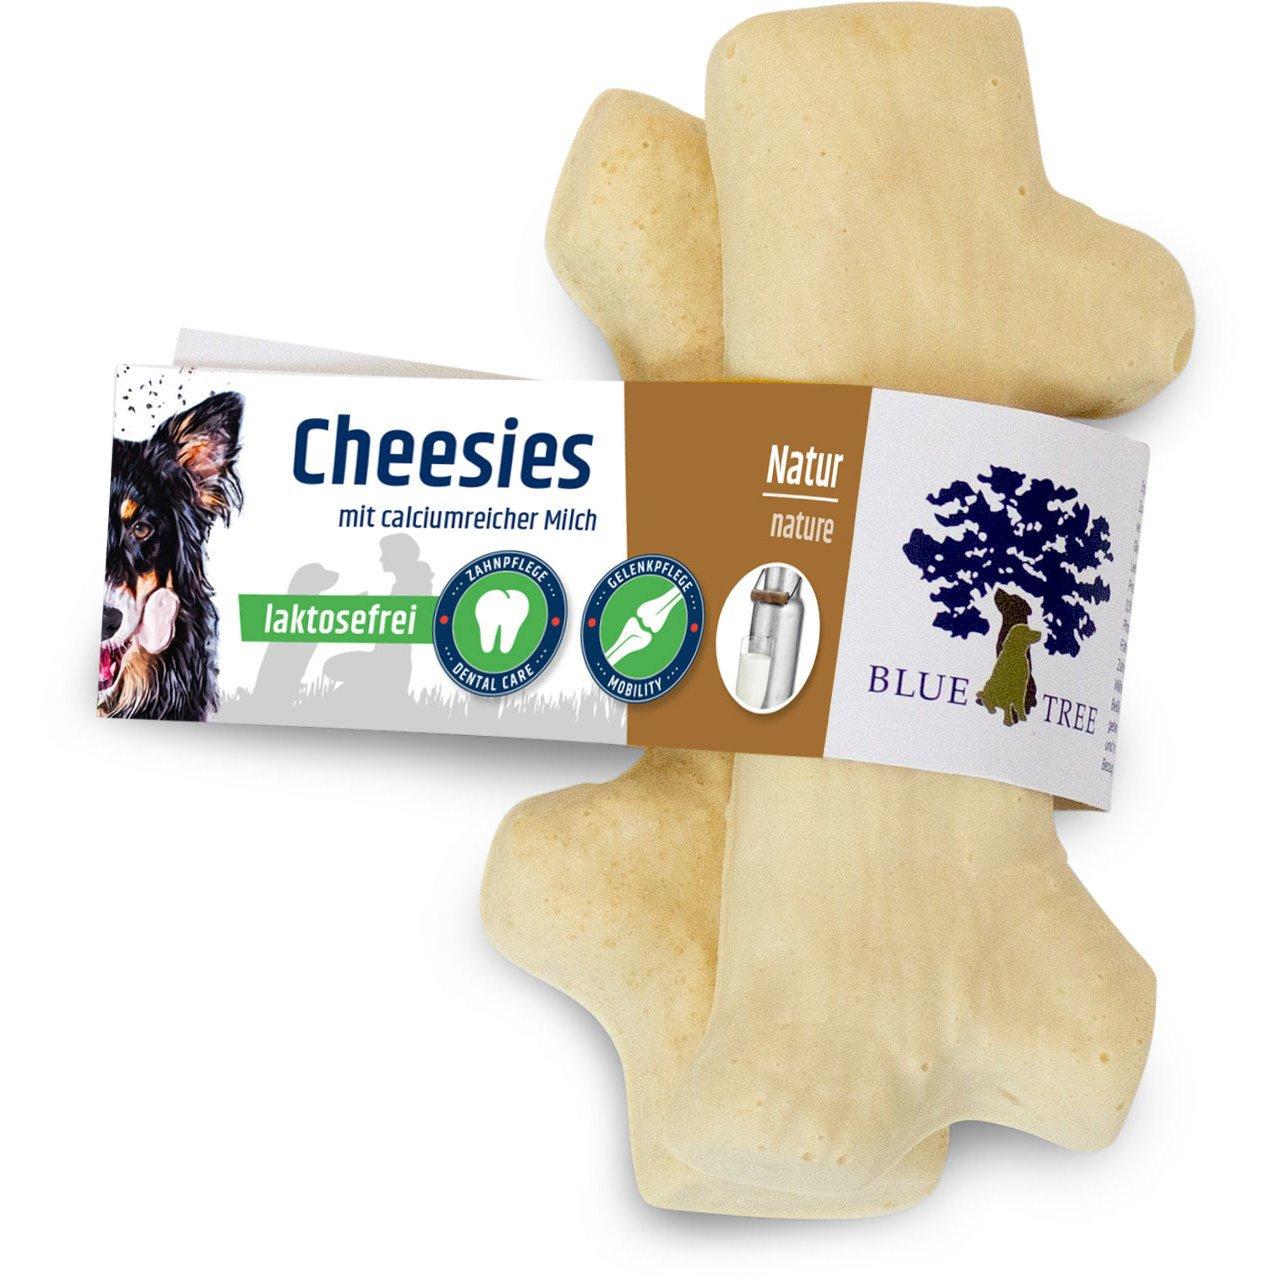 Blue Tree Cheesies Kausnacks mit laktosefreier Milch